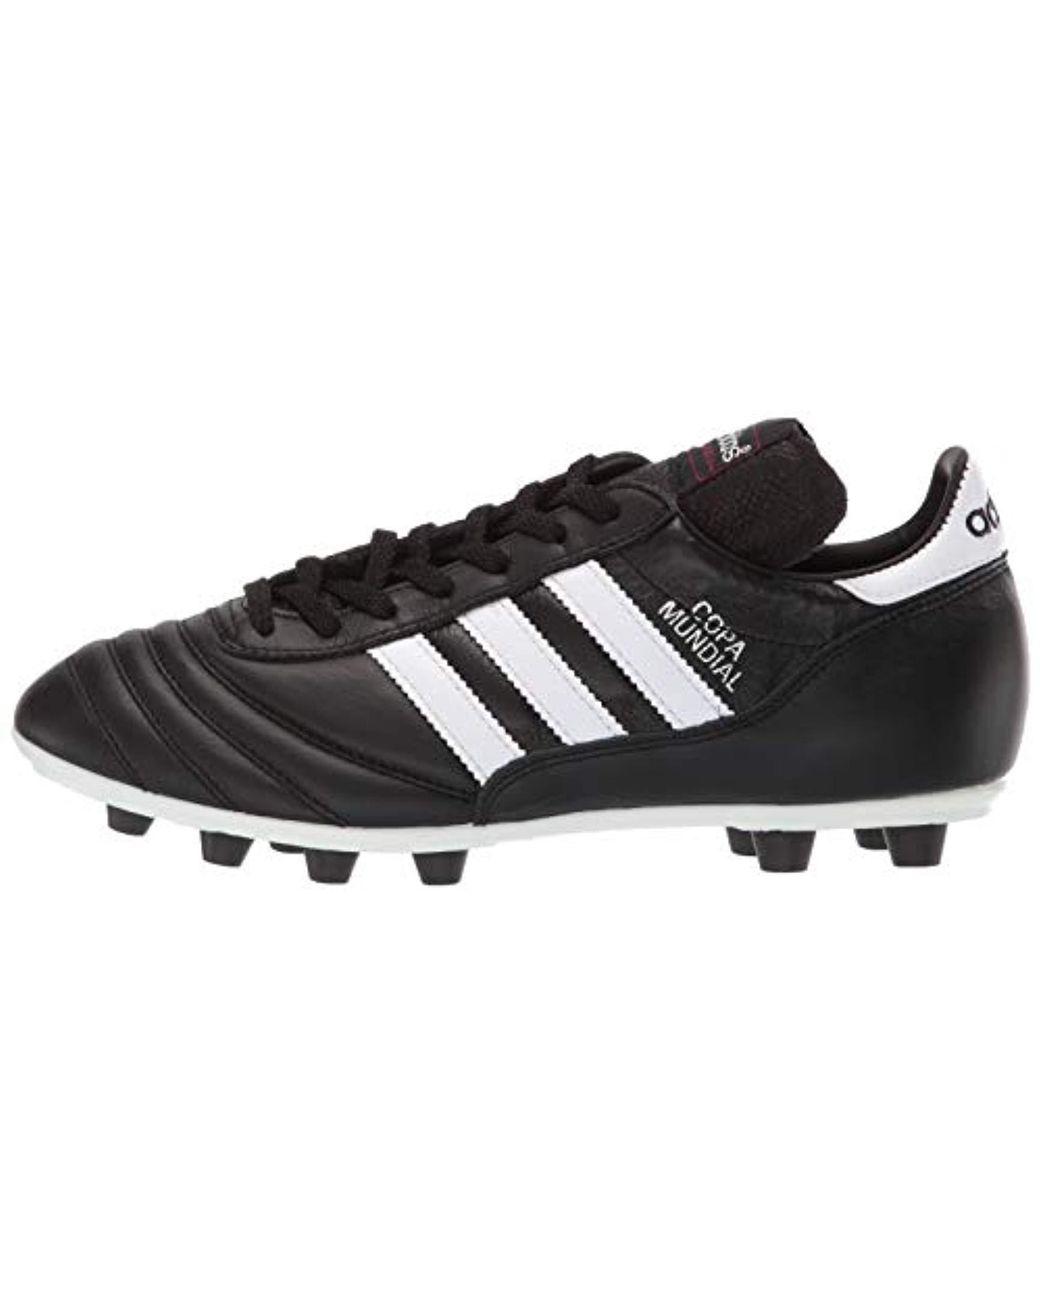 5c0455688dc28 Men's Black Performance Copa Mundial Soccer Shoe